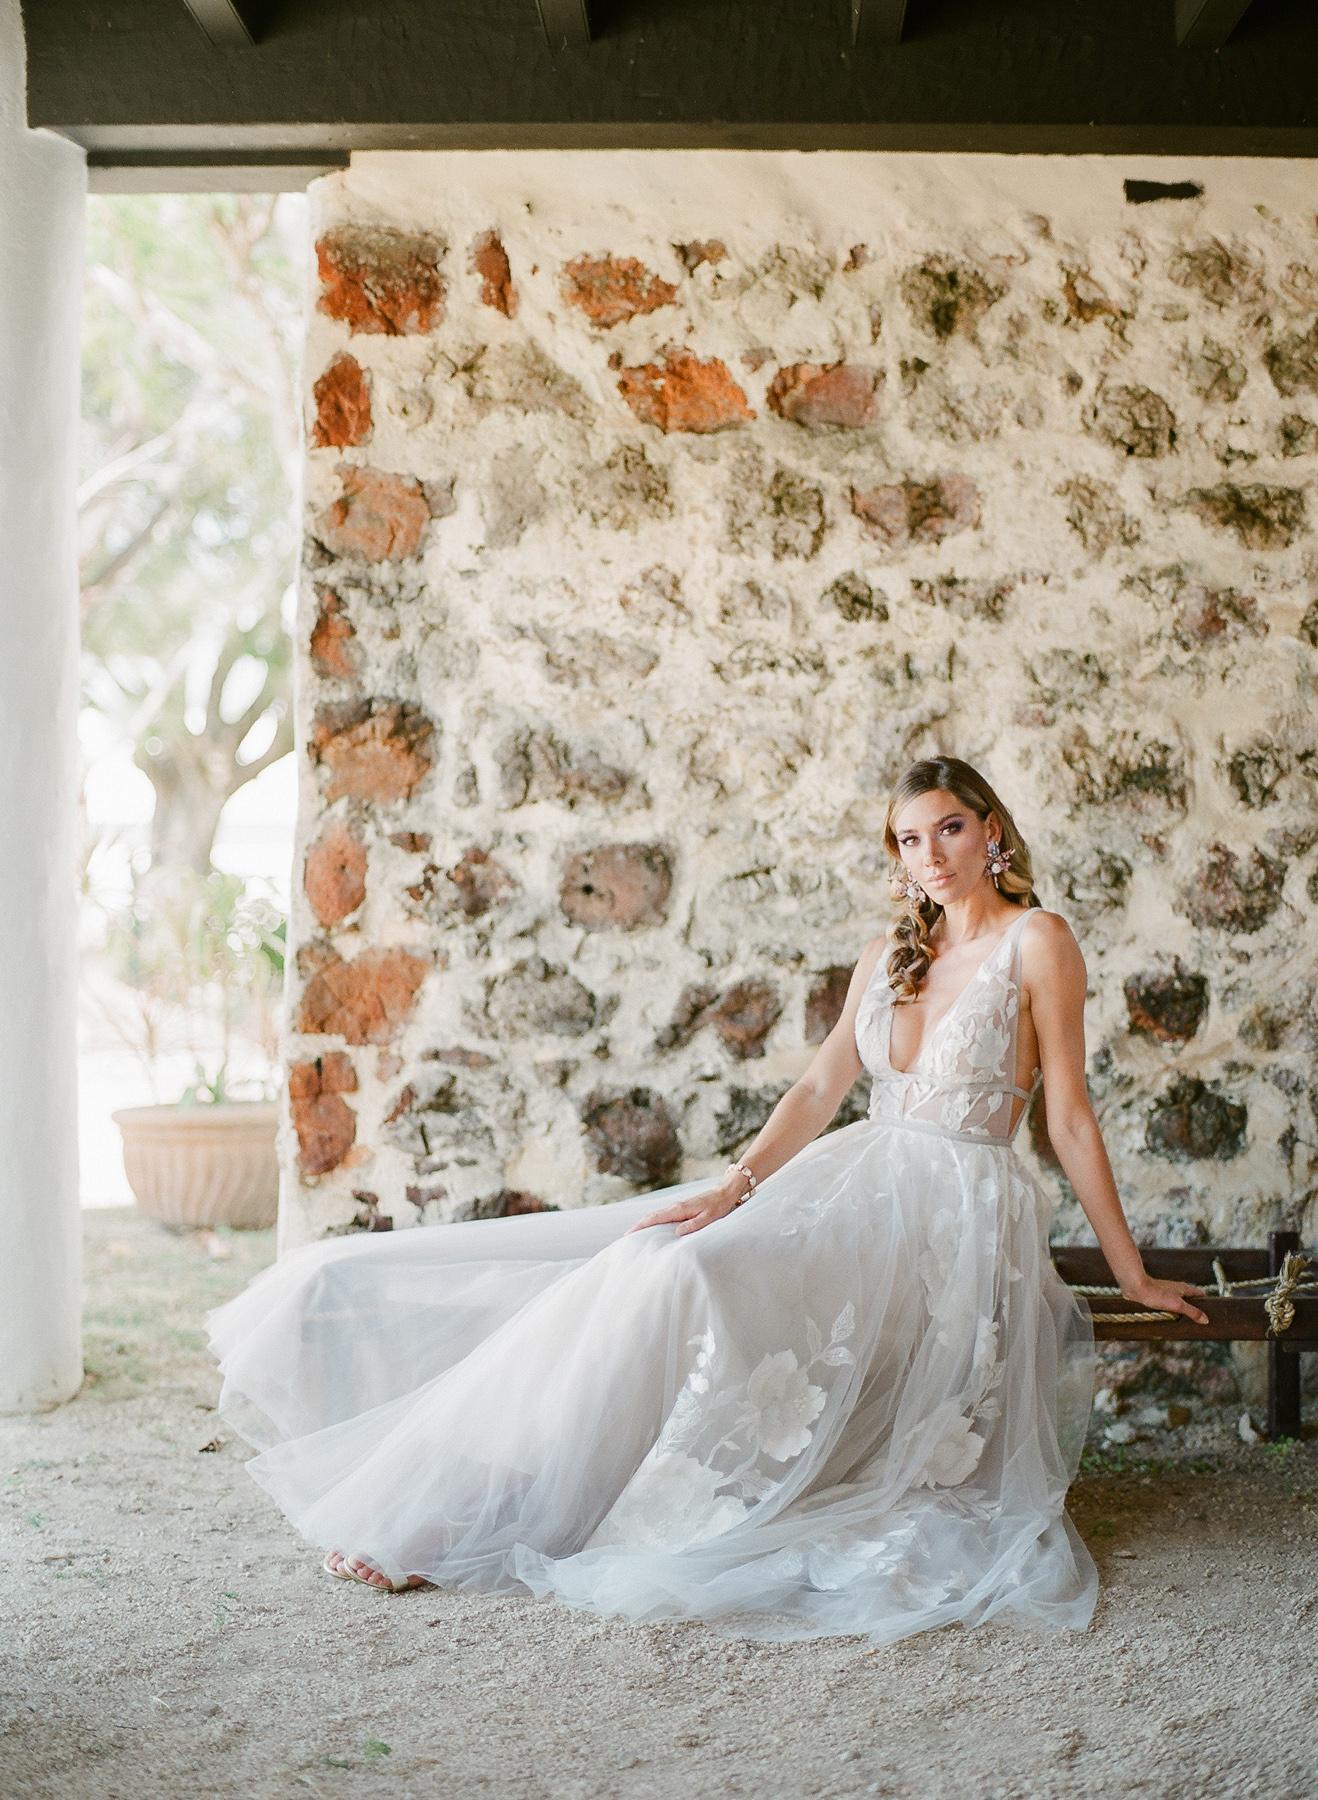 Grand-Cayman-Wedding-001.jpg